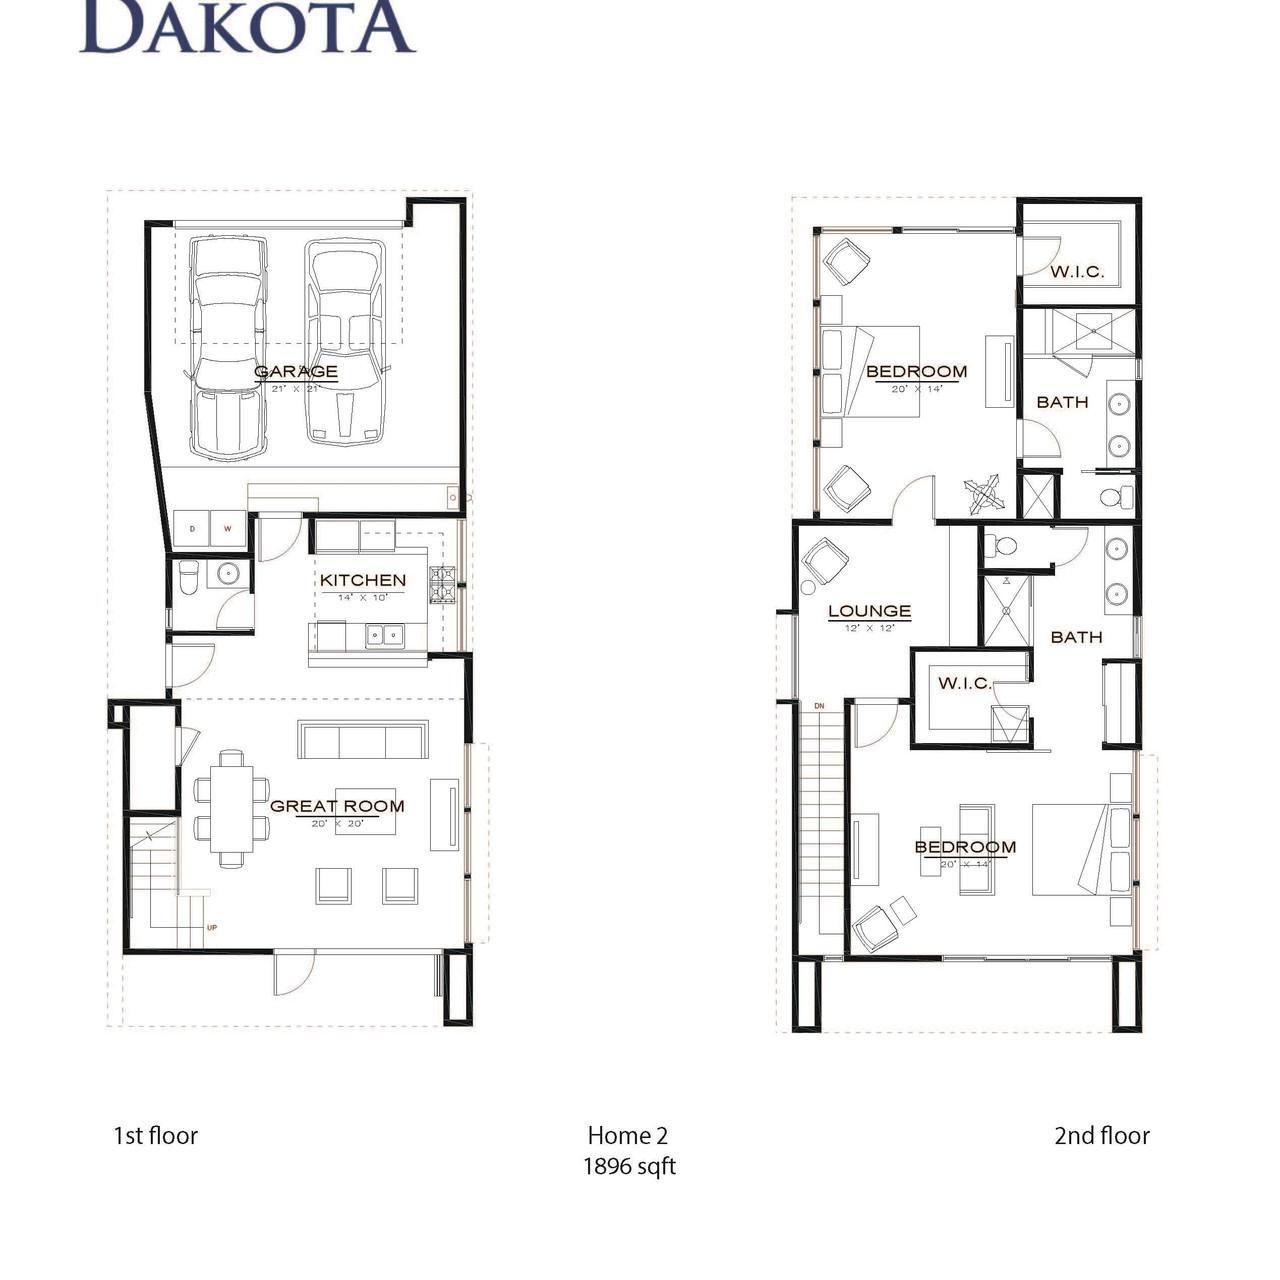 Dakota-Phase2-FloorPlans-Home 1_Page_2